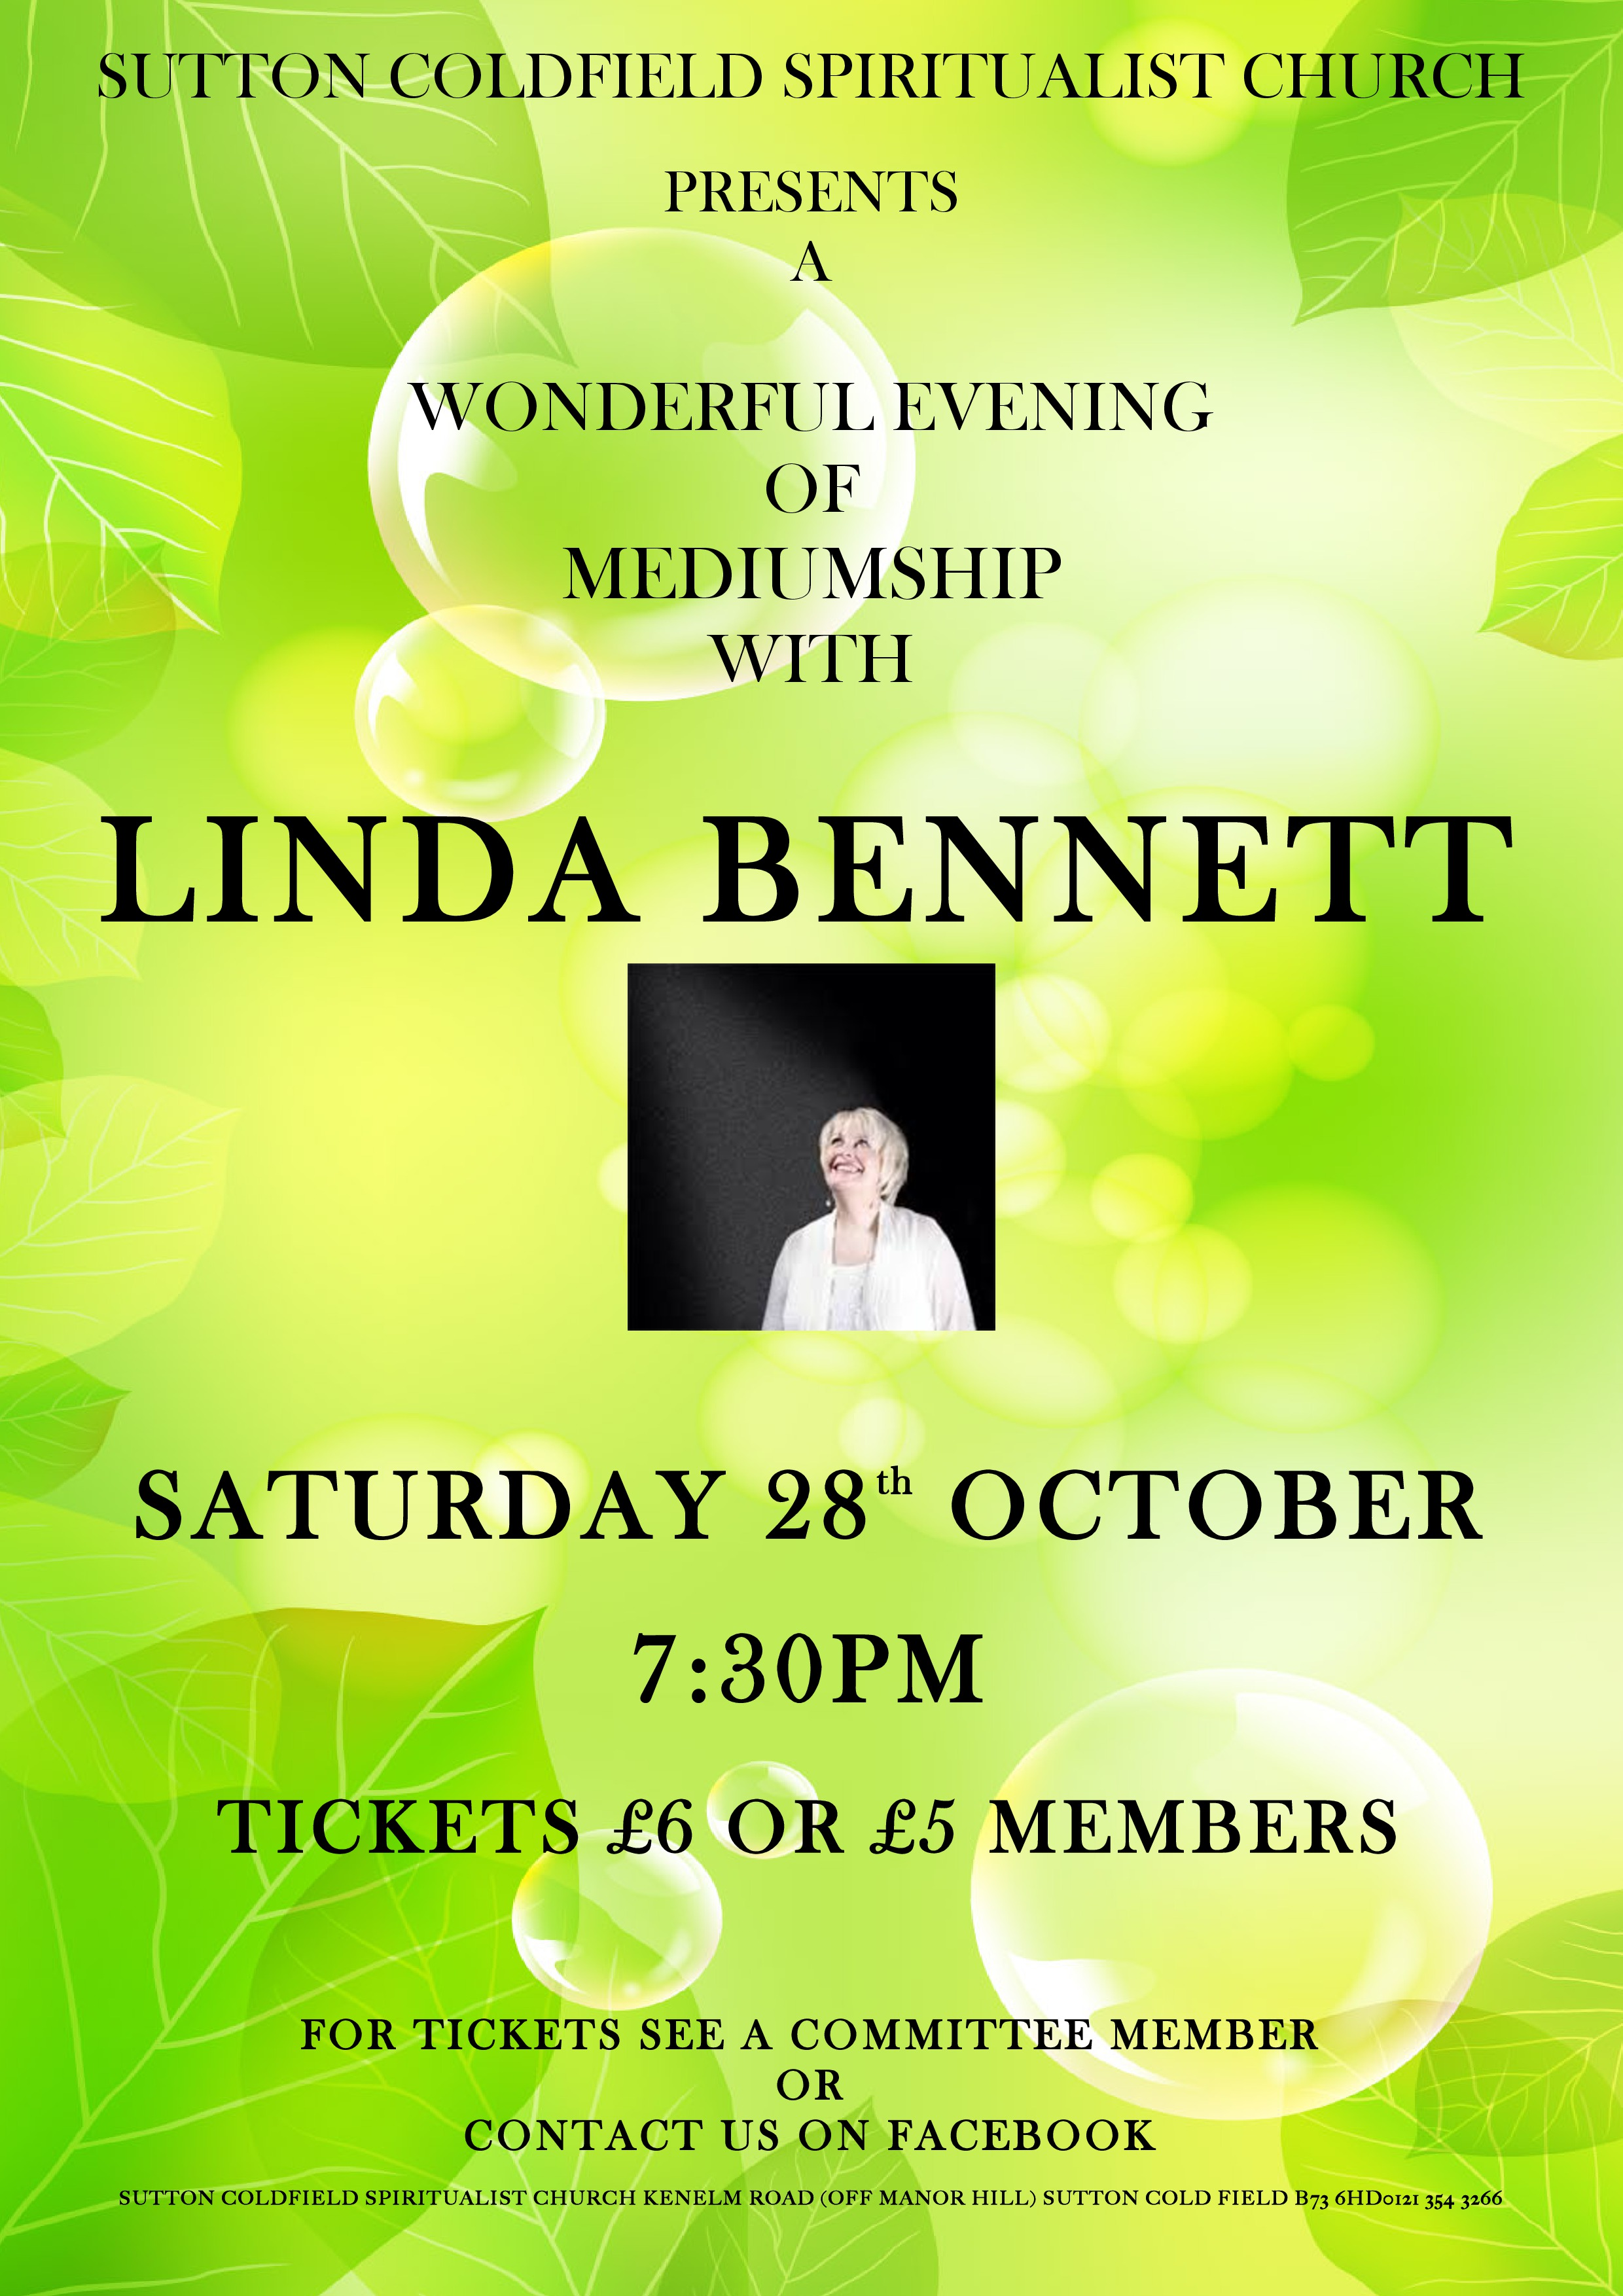 LINDA BENNETT POSTER-page-0